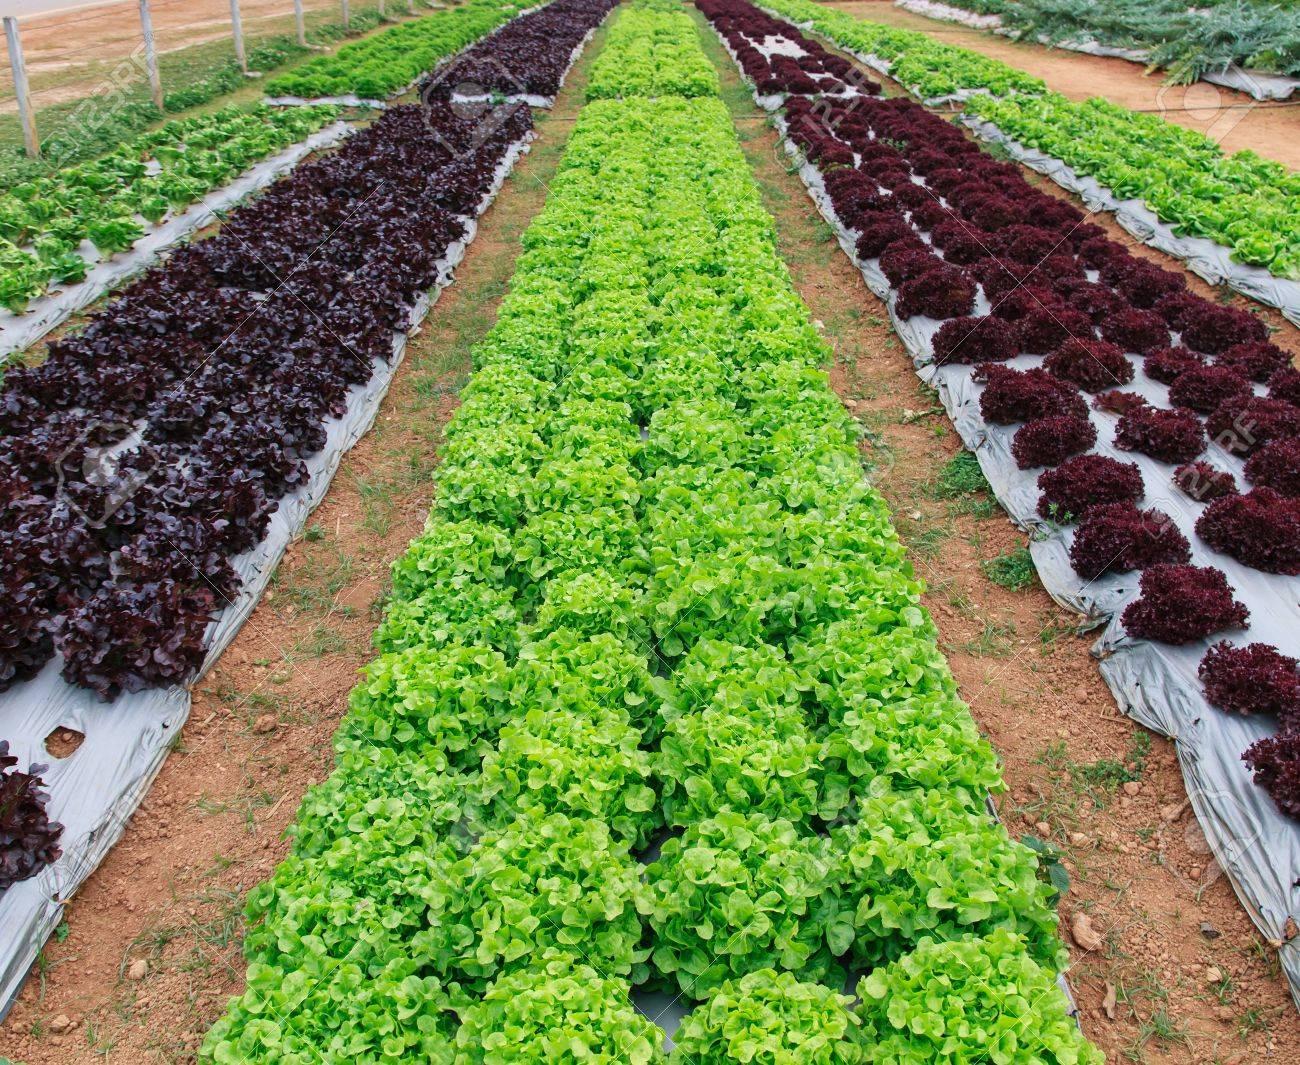 Vegetable garden rows - Growing Lettuce In Rows In The Vegetable Garden Stock Photo 20314608